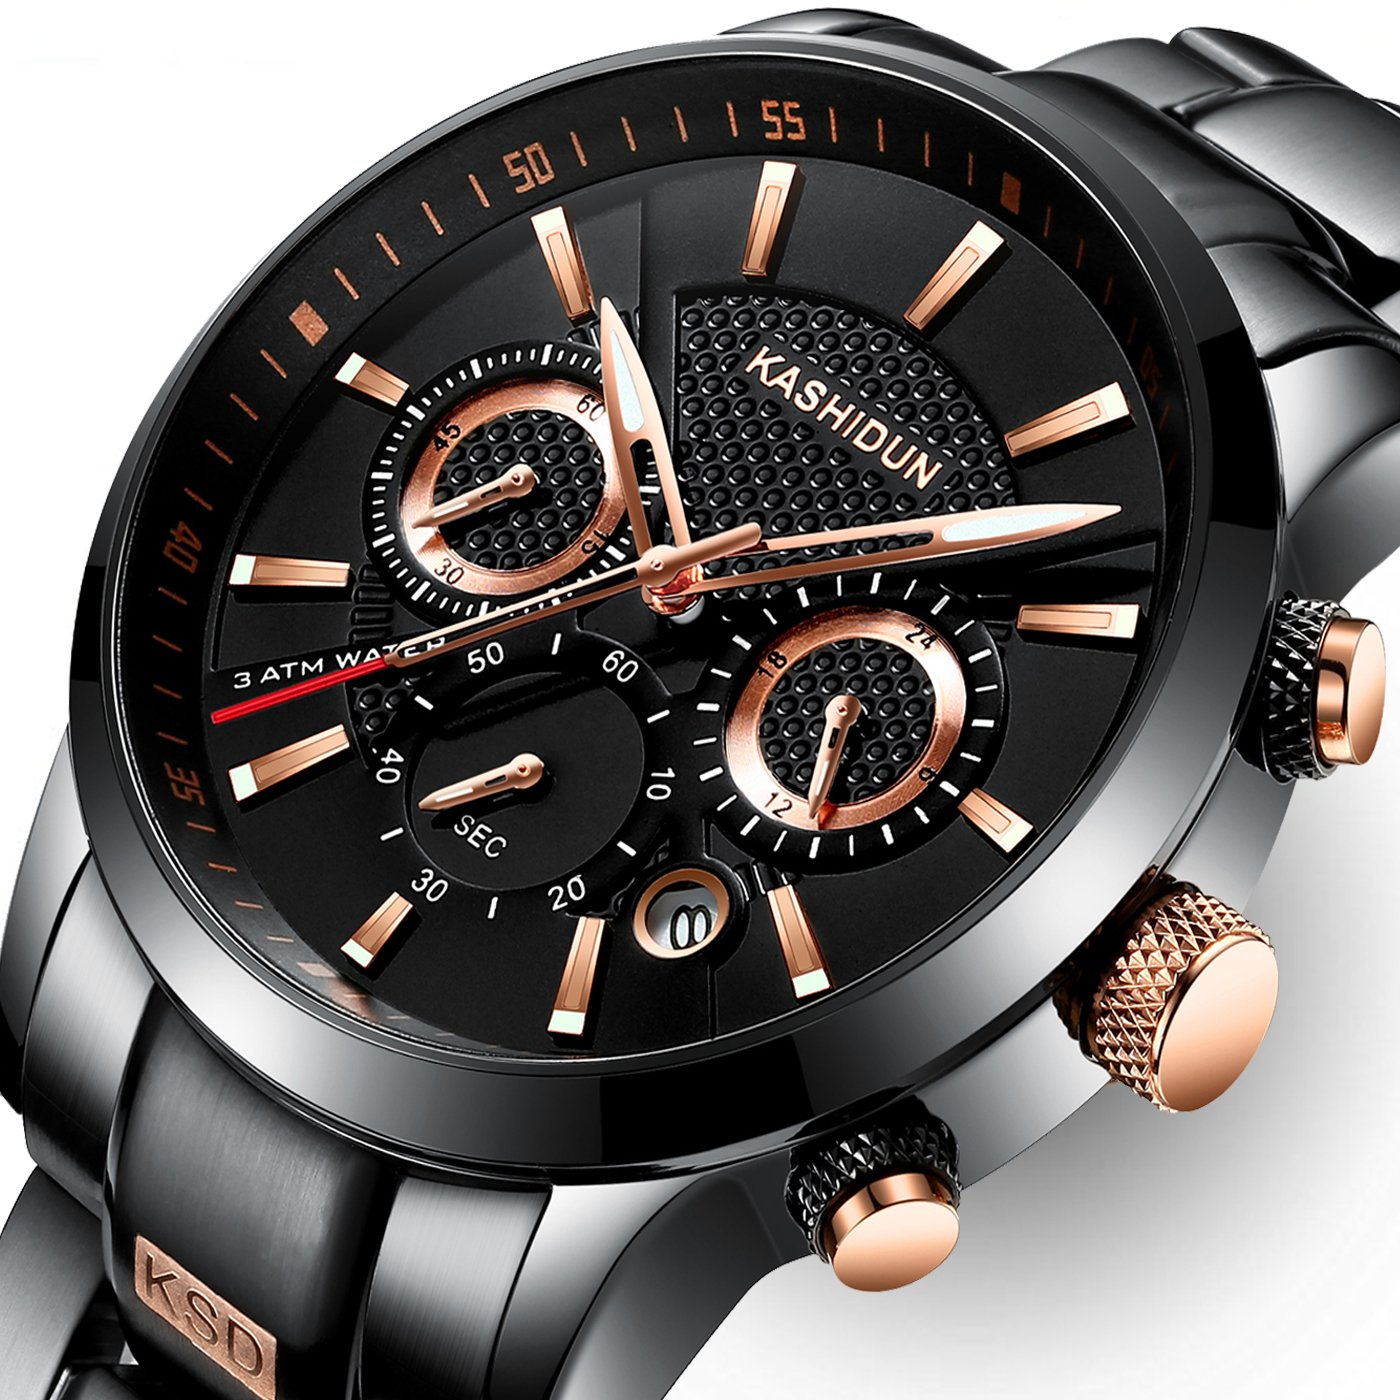 KASHIDUN Men's Watches Luxury Sports Military Army Quartz Waterproof Wristwatch Calendar Date Stainless Steel Band Black Color Rose Gold Hands